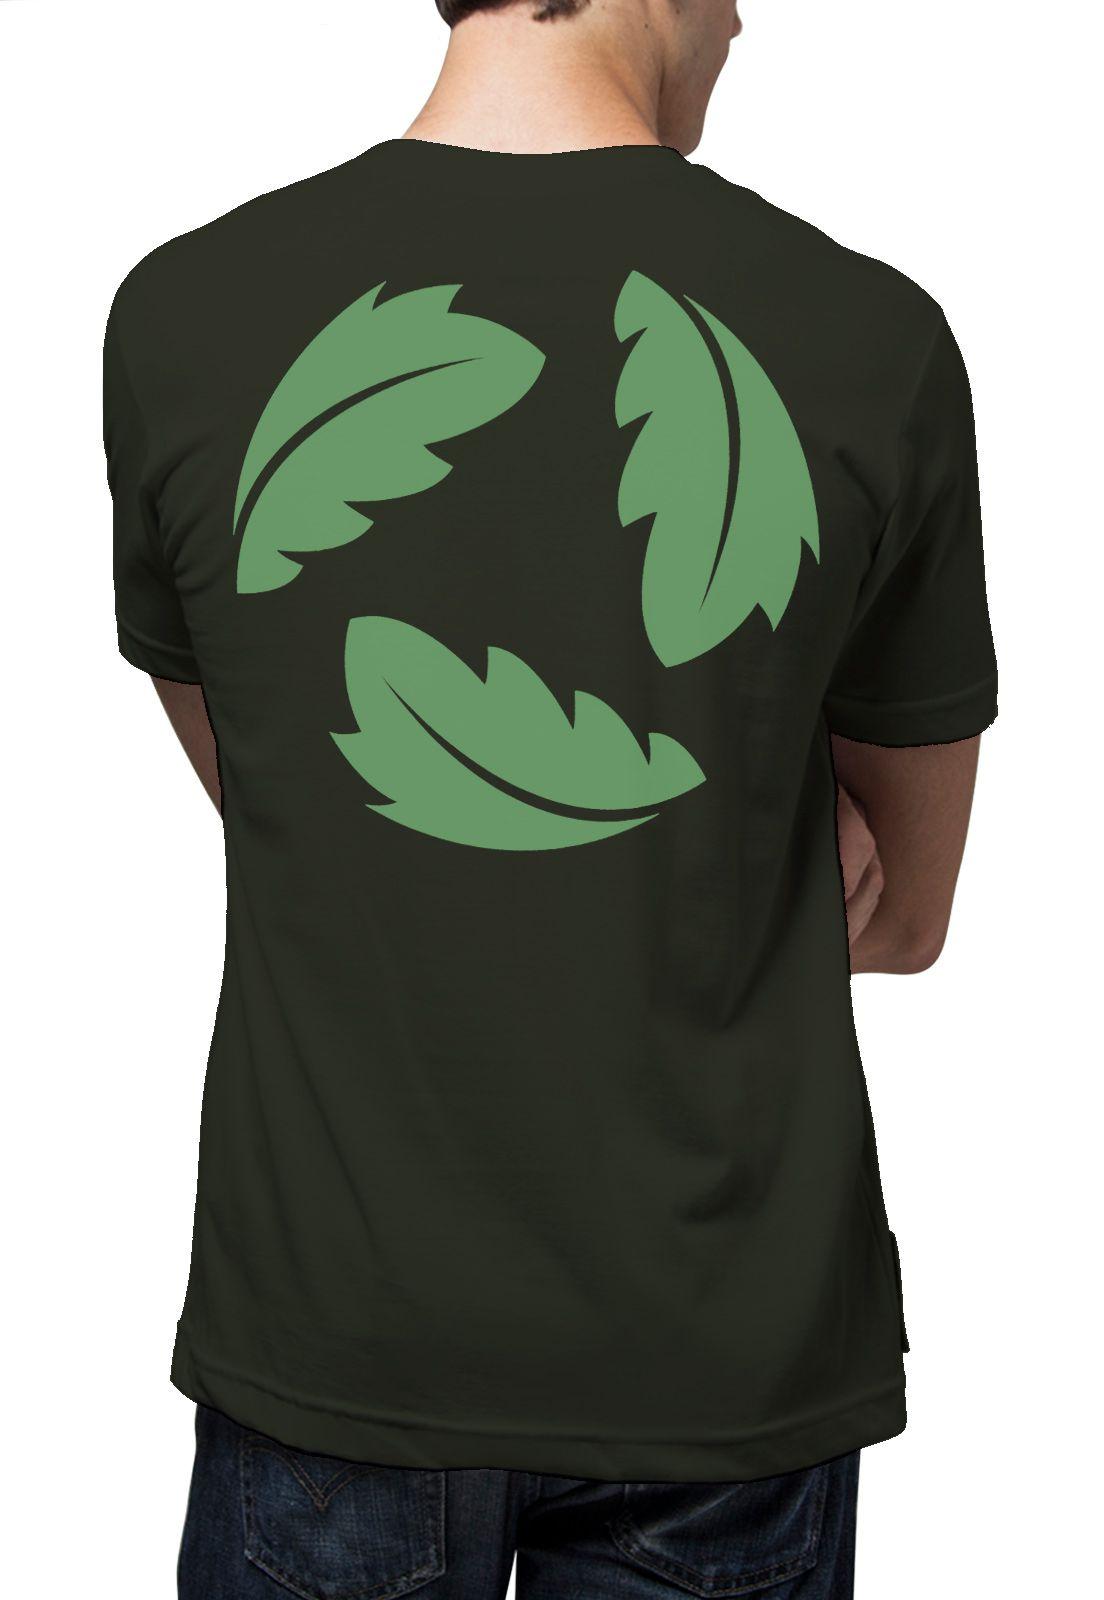 Camiseta Amazônia Folhas Recicle - Verde Escuro